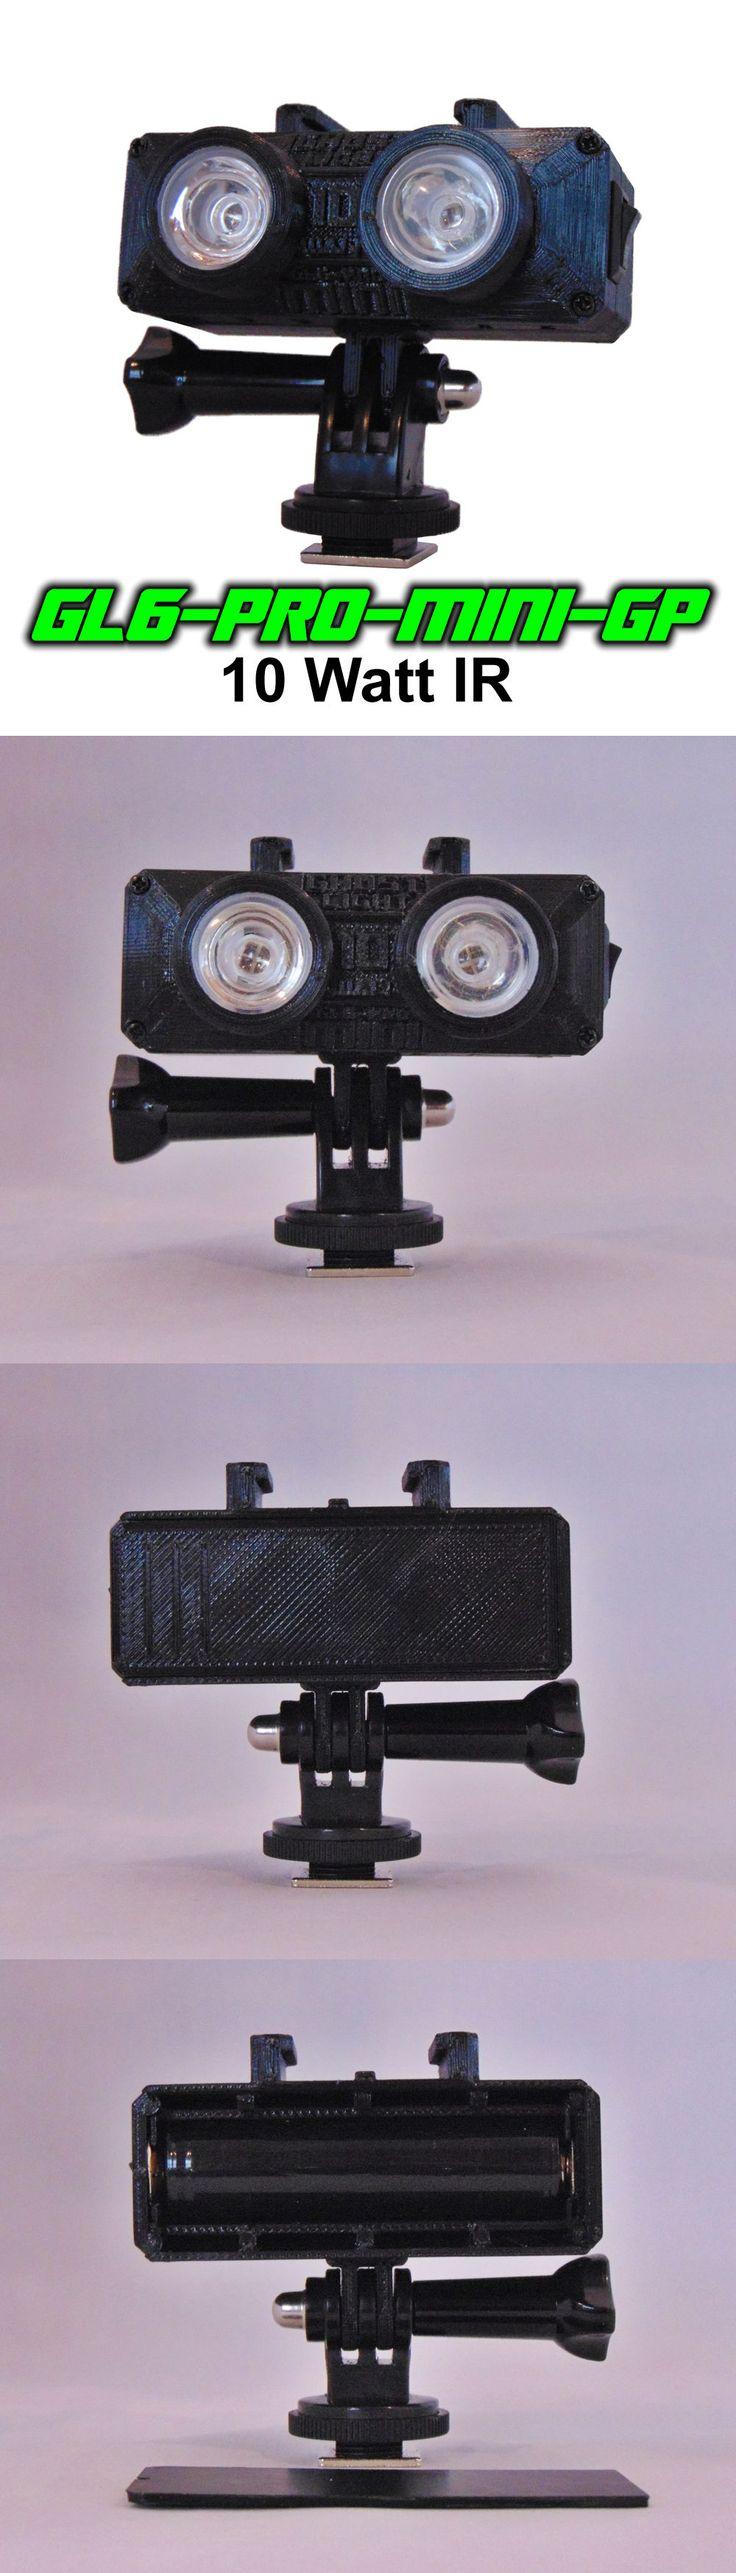 Surveillance Gadgets: Ghost Light™ Gl6-Pro-Mini-Gp 10 Watt Ir Led Light For Full Spectrum Camera Gopro -> BUY IT NOW ONLY: $99.95 on eBay!